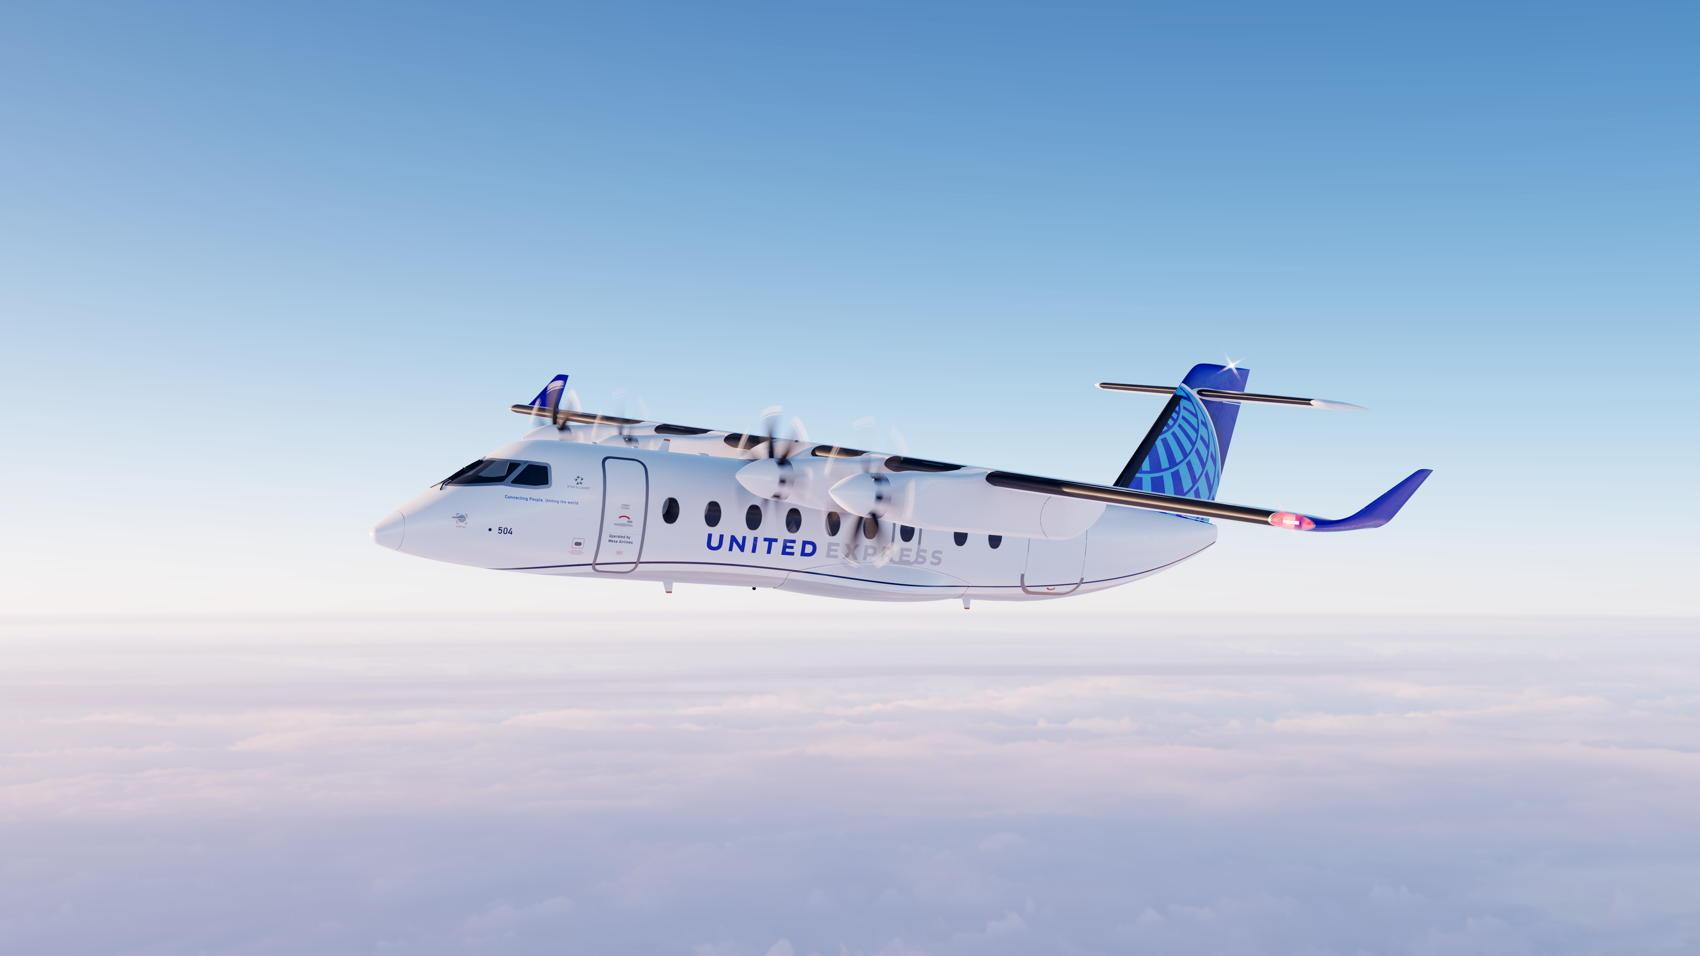 ES.19 United - Credit Heart Aerospace